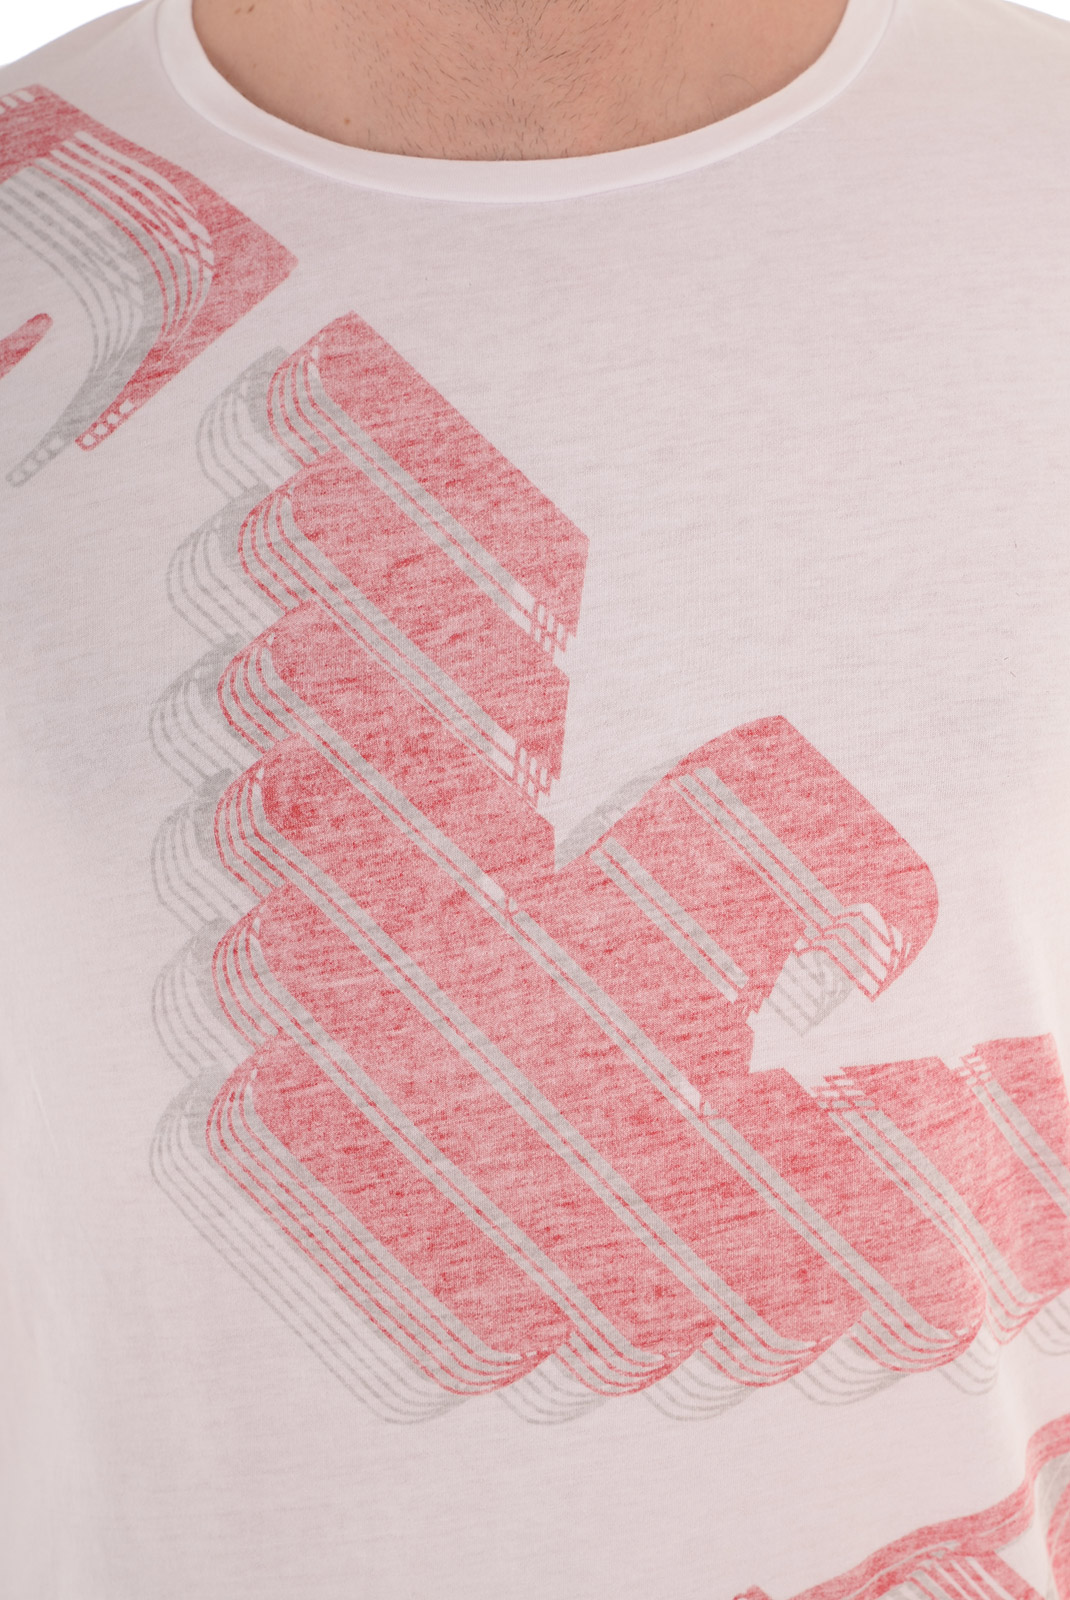 Tee-shirts  Emporio armani 211123 5P458 010 WHITE